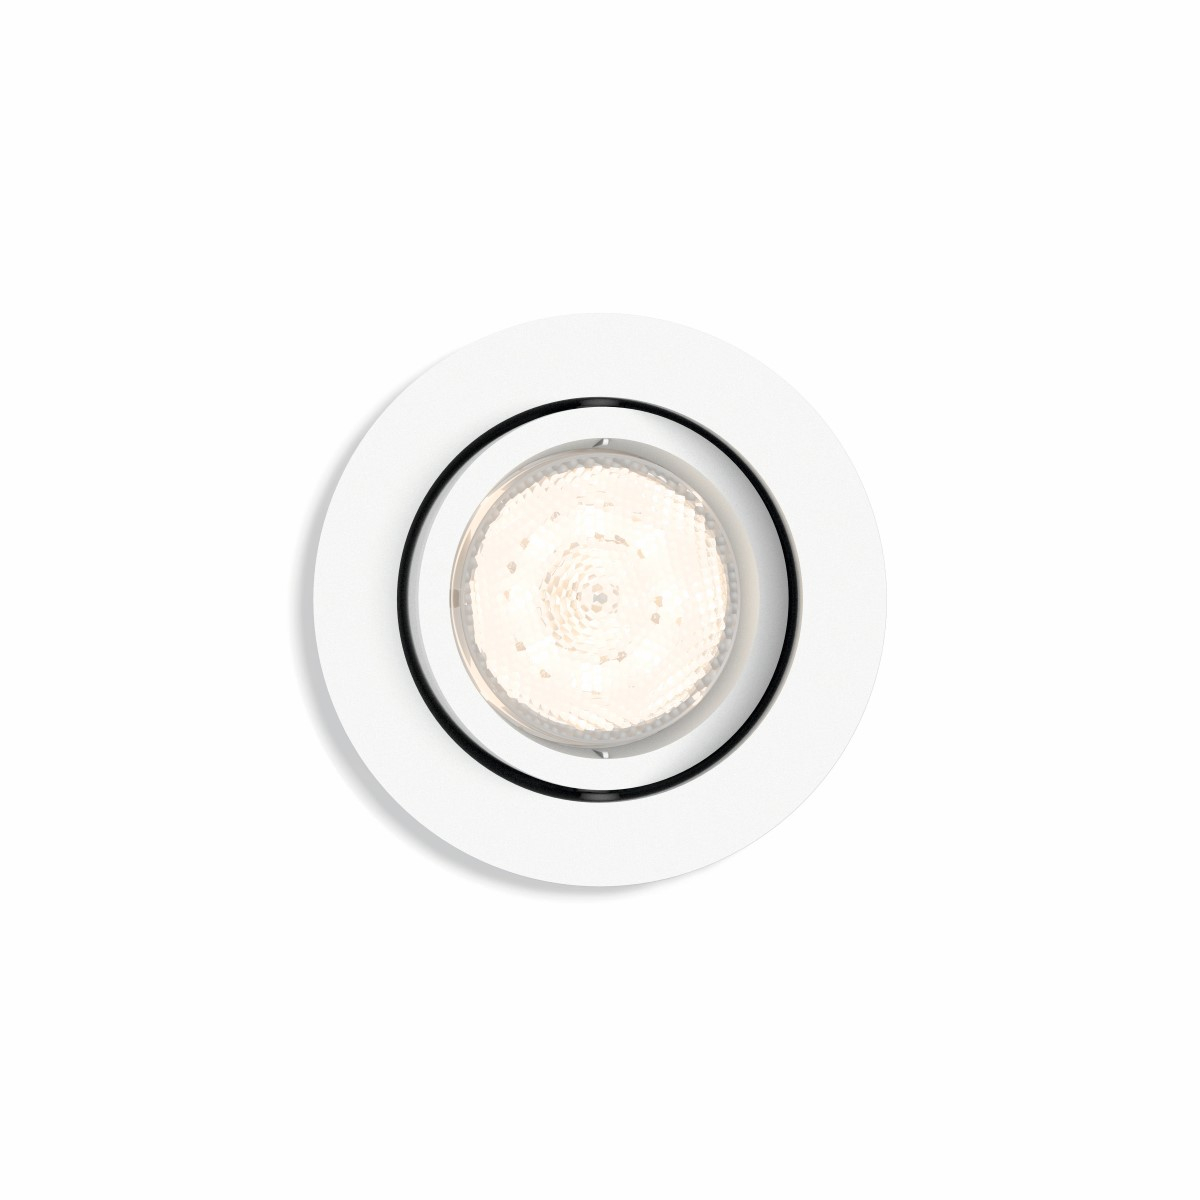 Philips Lighting Shellbark 5020131P0 LED-inbouwlamp 4.5 W Warm-wit Wit